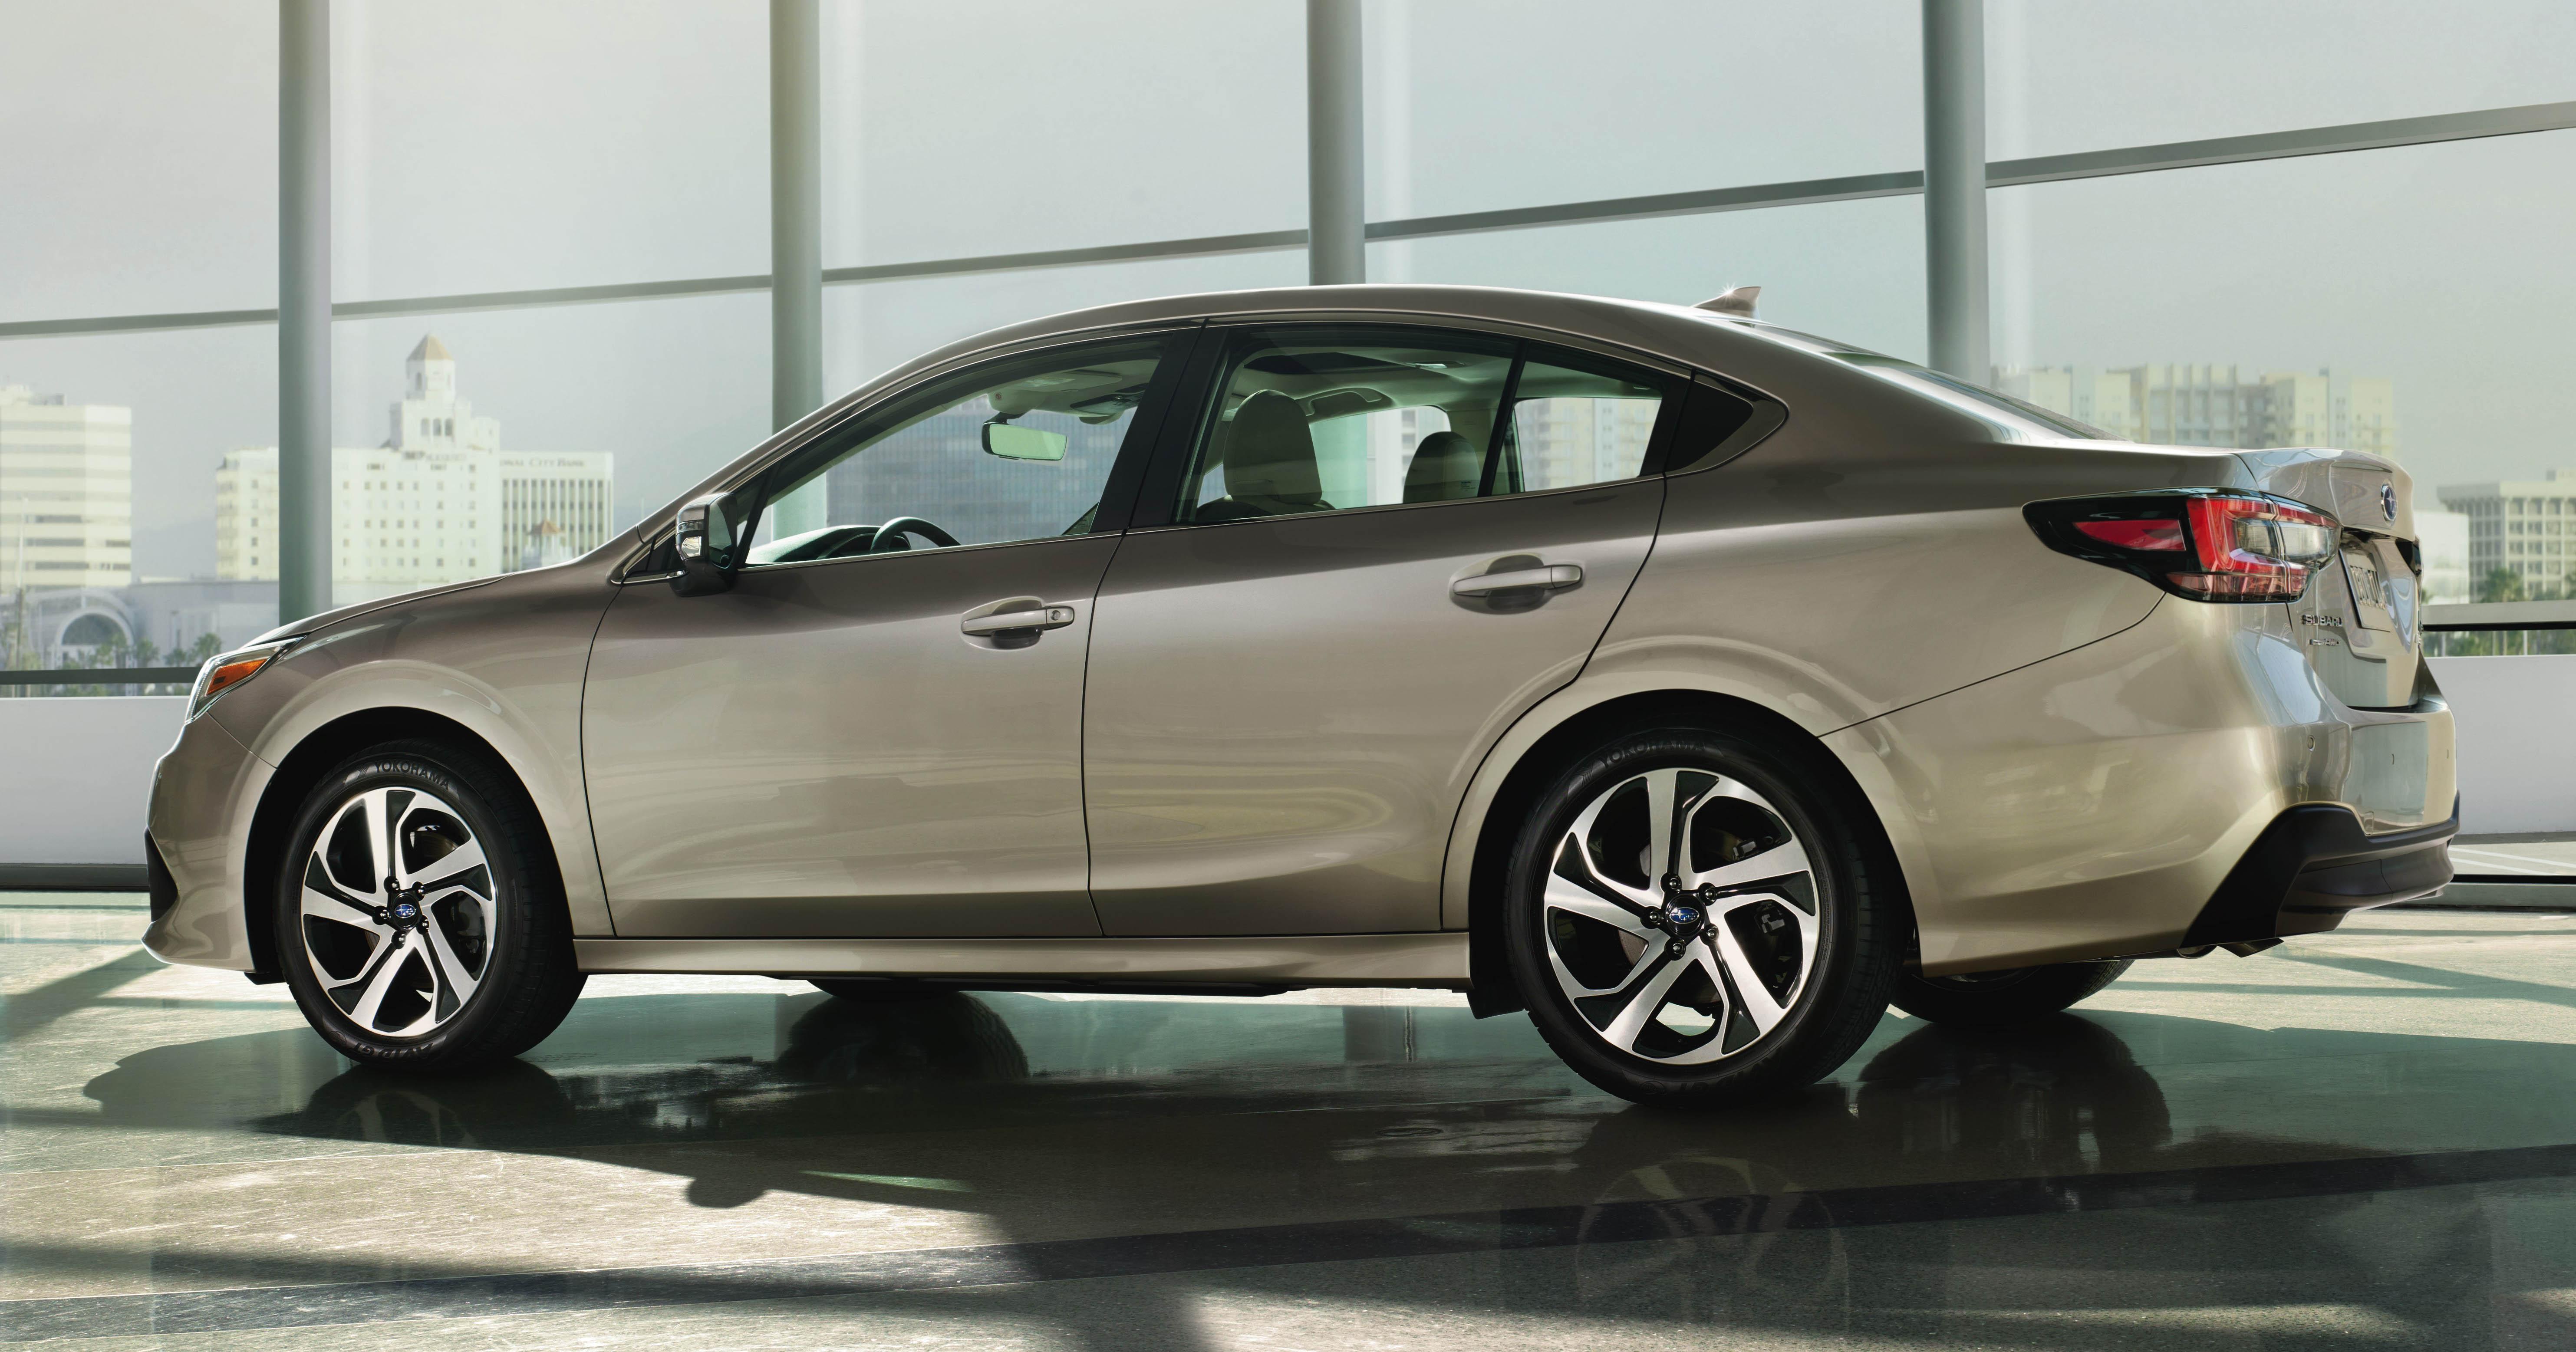 2020 subaru legacy unveiled at chicago auto show - 2.4l